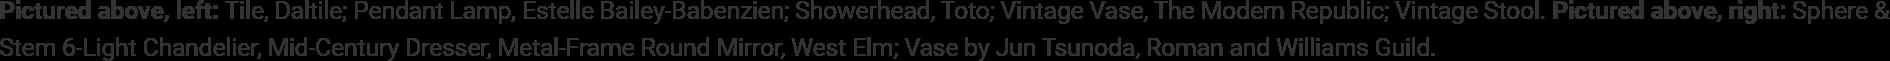 Pictured above, left: Tile, Daltile; Pendant Lamp, Estelle Bailey-Babenzien; Showerhead, Toto; Vintage Vase, The Modern Republic; Vintage Stool. Pictured above, right: Sphere & Stem 6-Light Chandelier, Mid-Century Dresser, Metal-Frame Round Mirror, West Elm; Vase by Jun Tsunoda, Roman and Williams Guild.